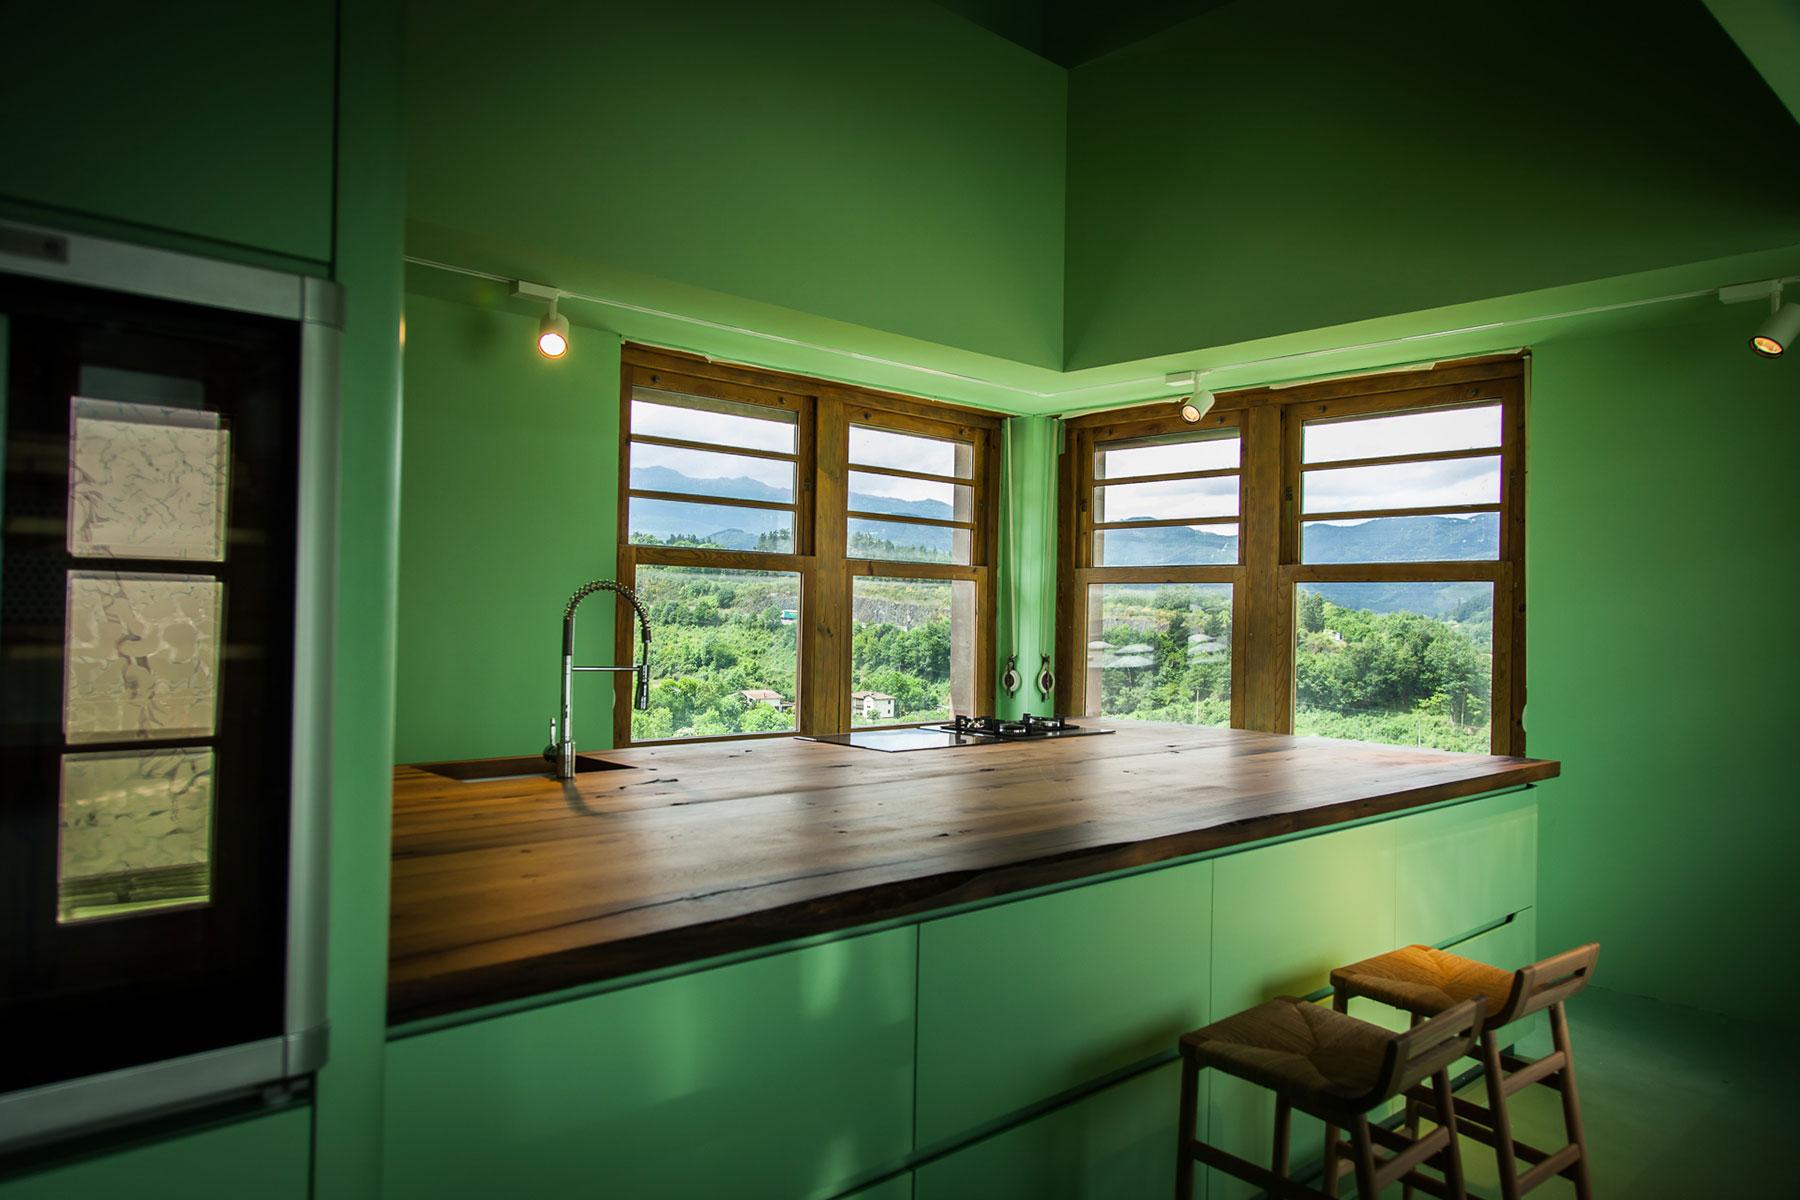 The-Green-kitchen